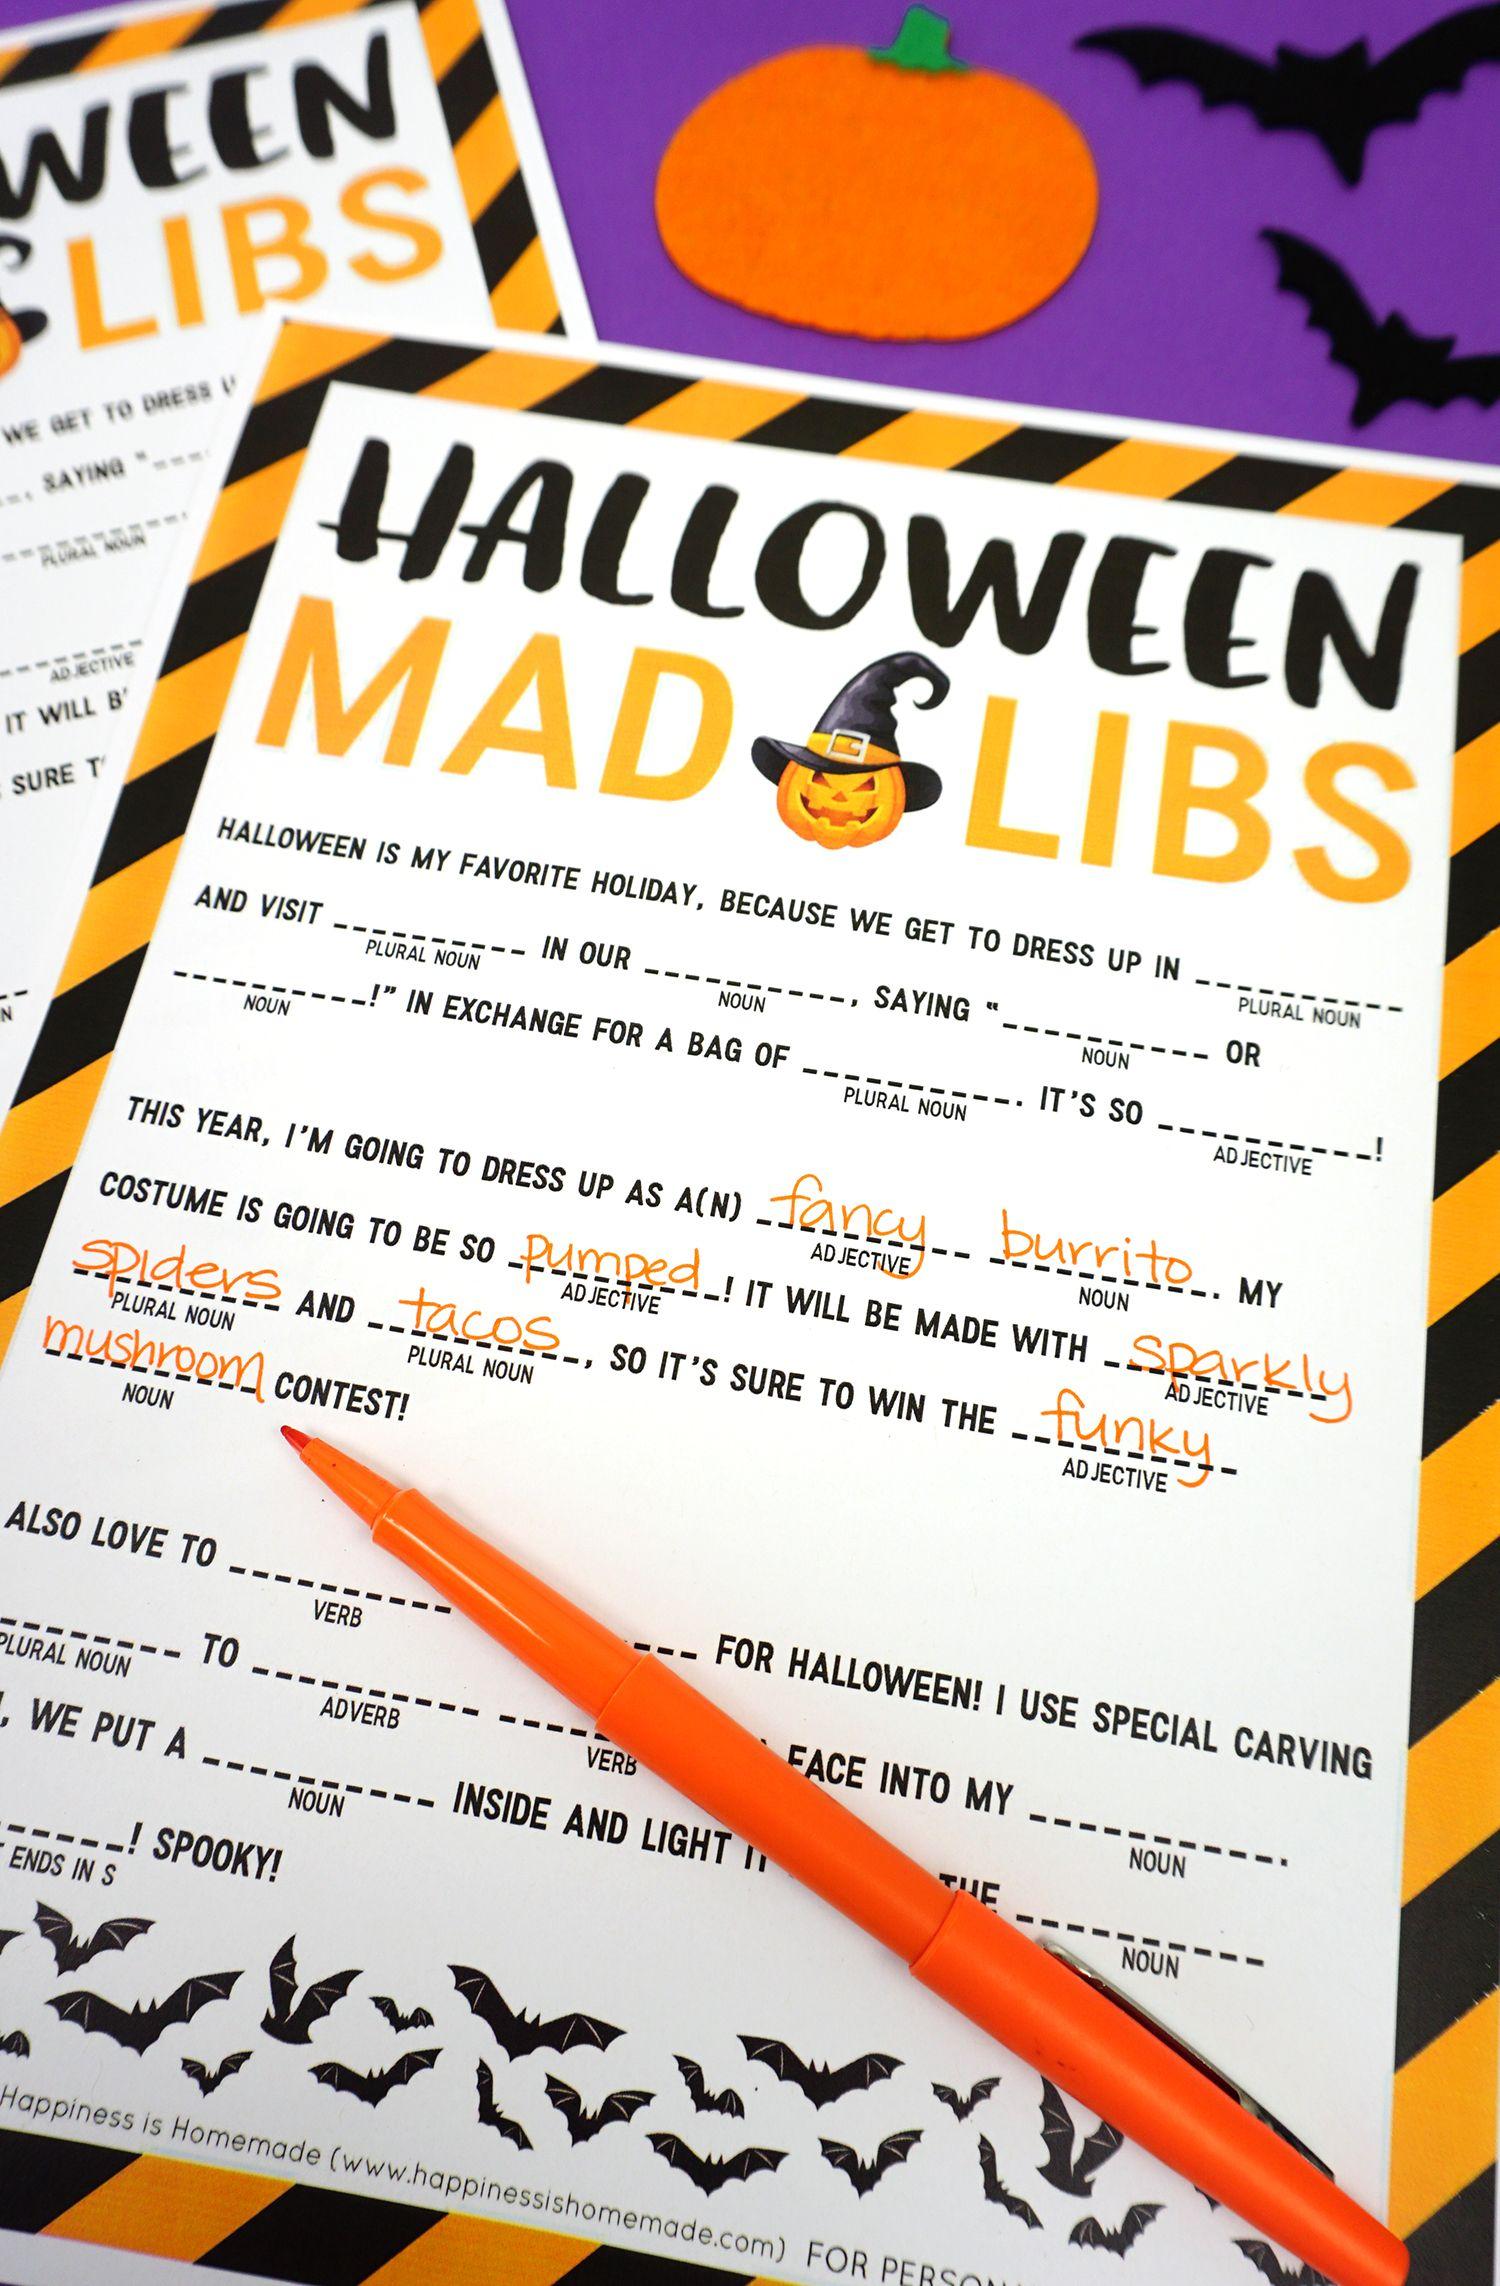 Halloween Mad Libs Printable